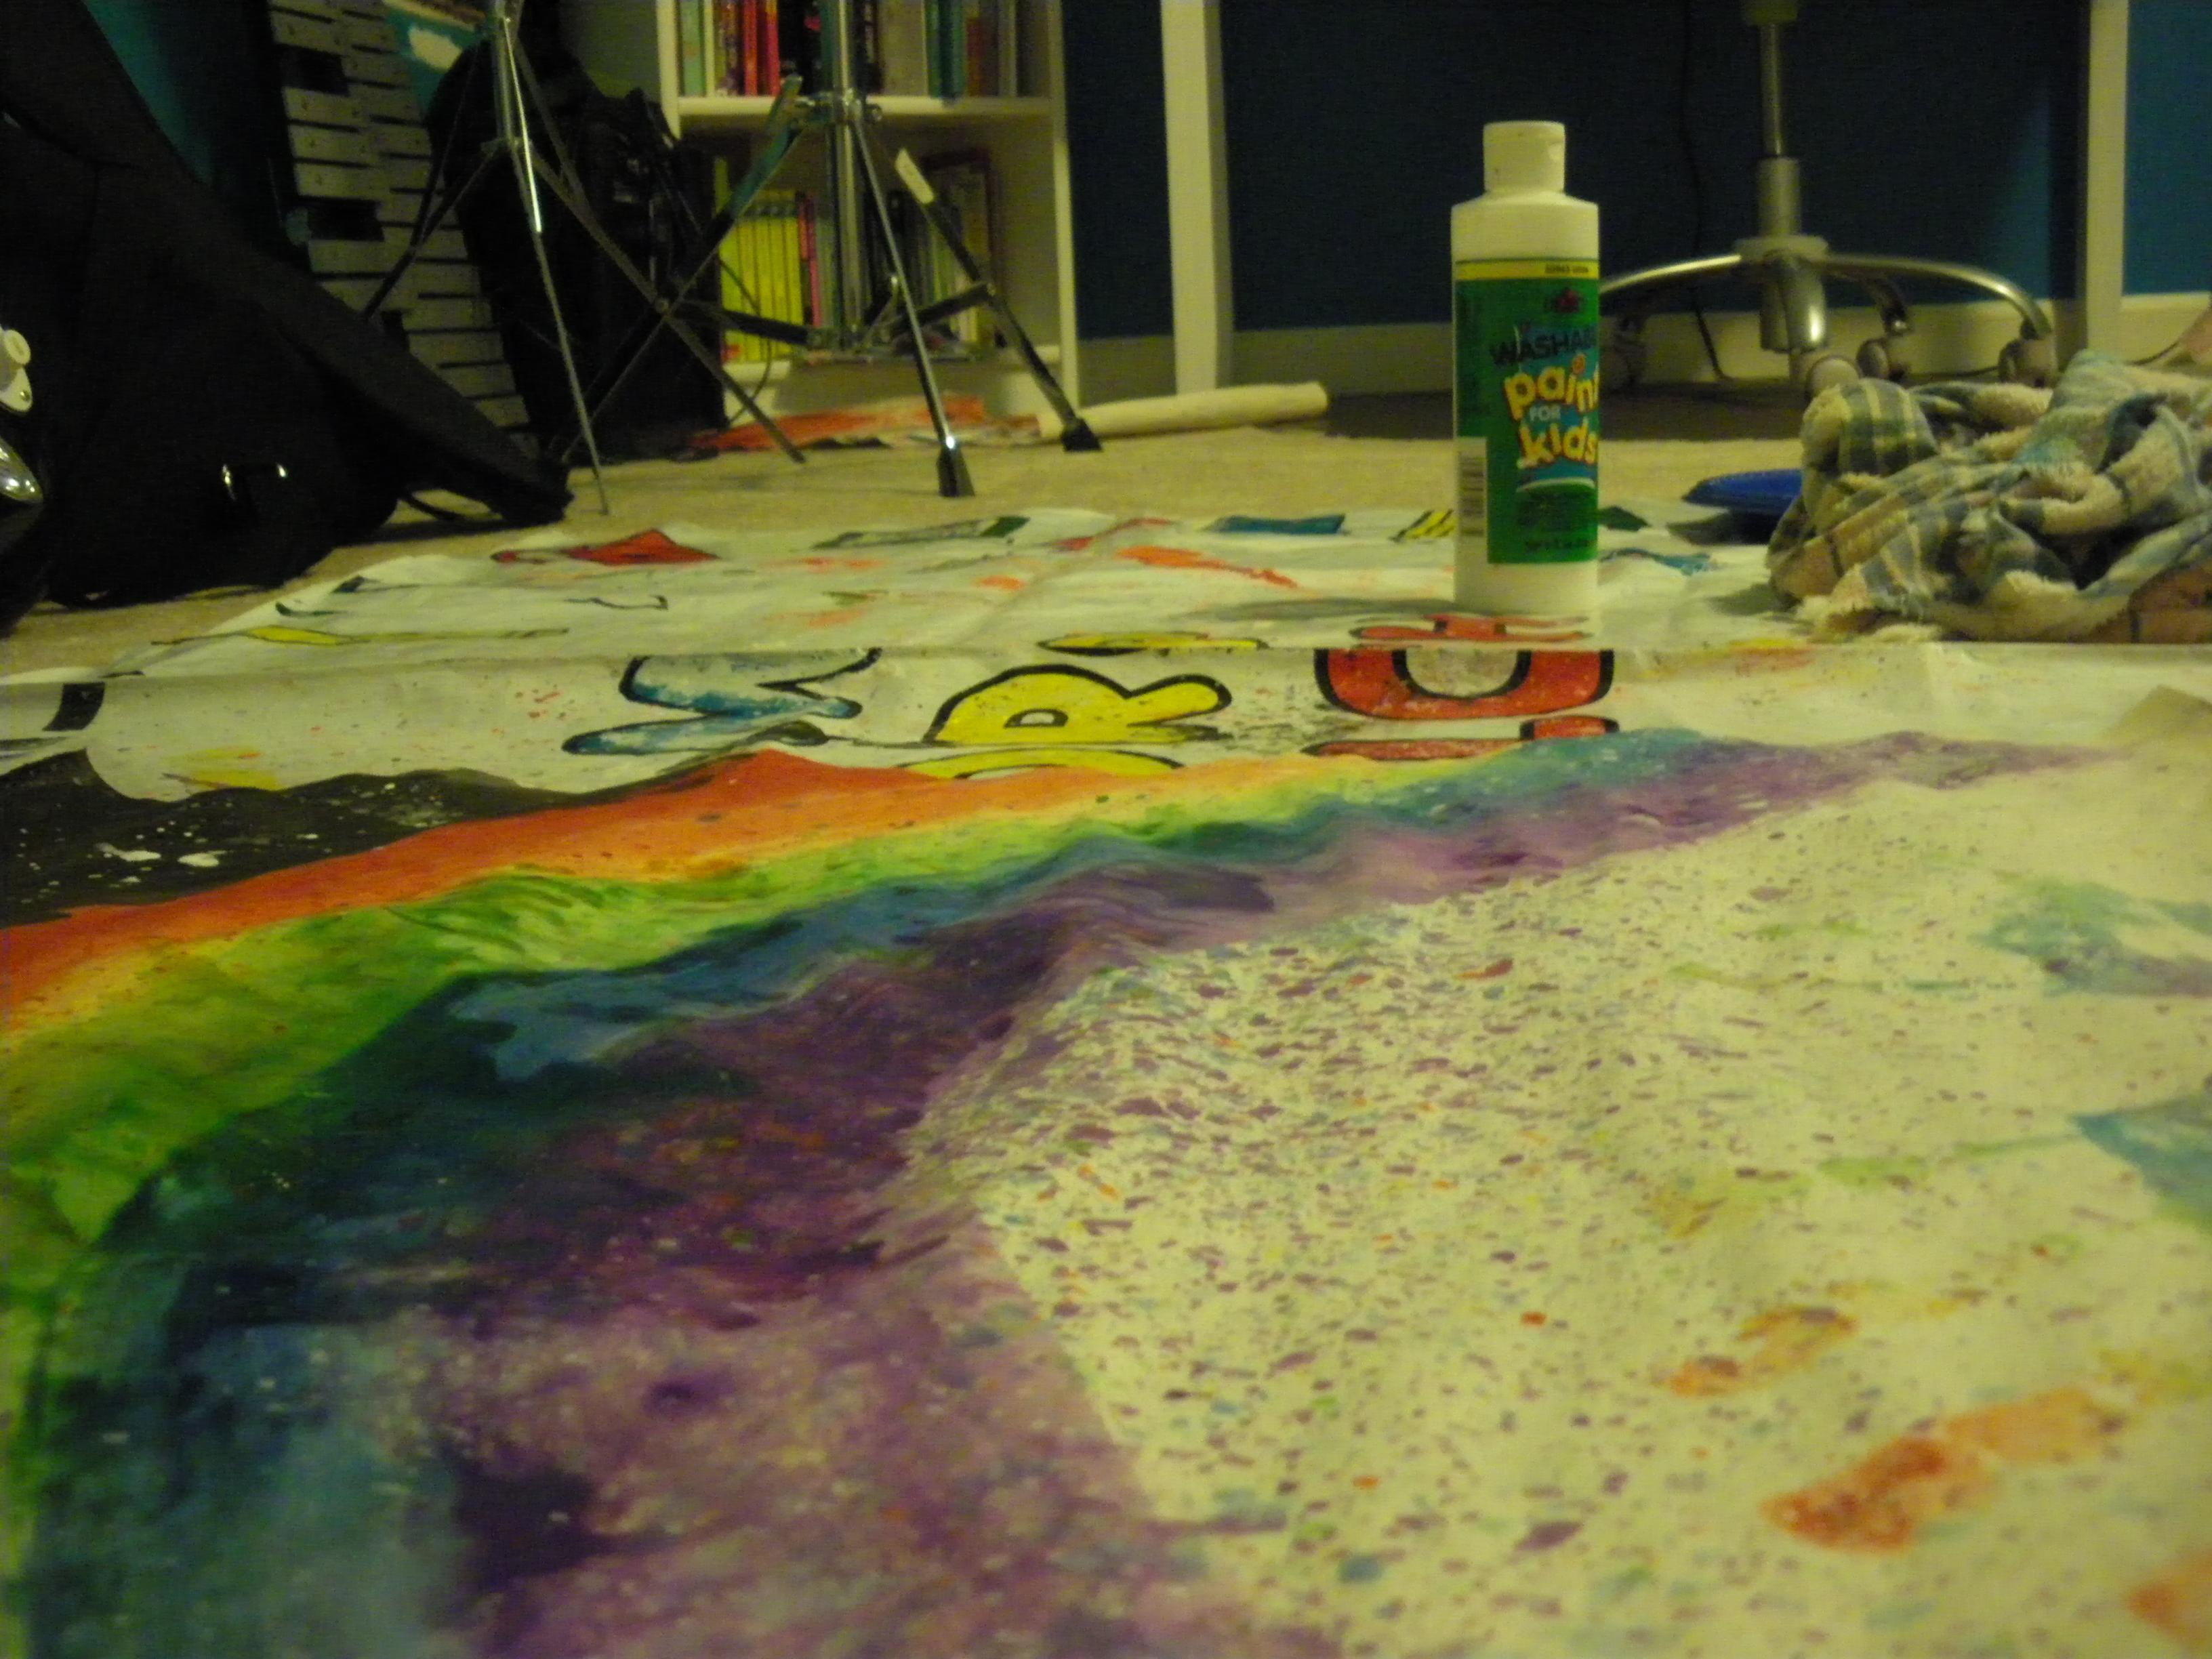 http://fc08.deviantart.net/fs71/f/2010/009/c/0/My_Workspace_by_Rosieanime.jpg